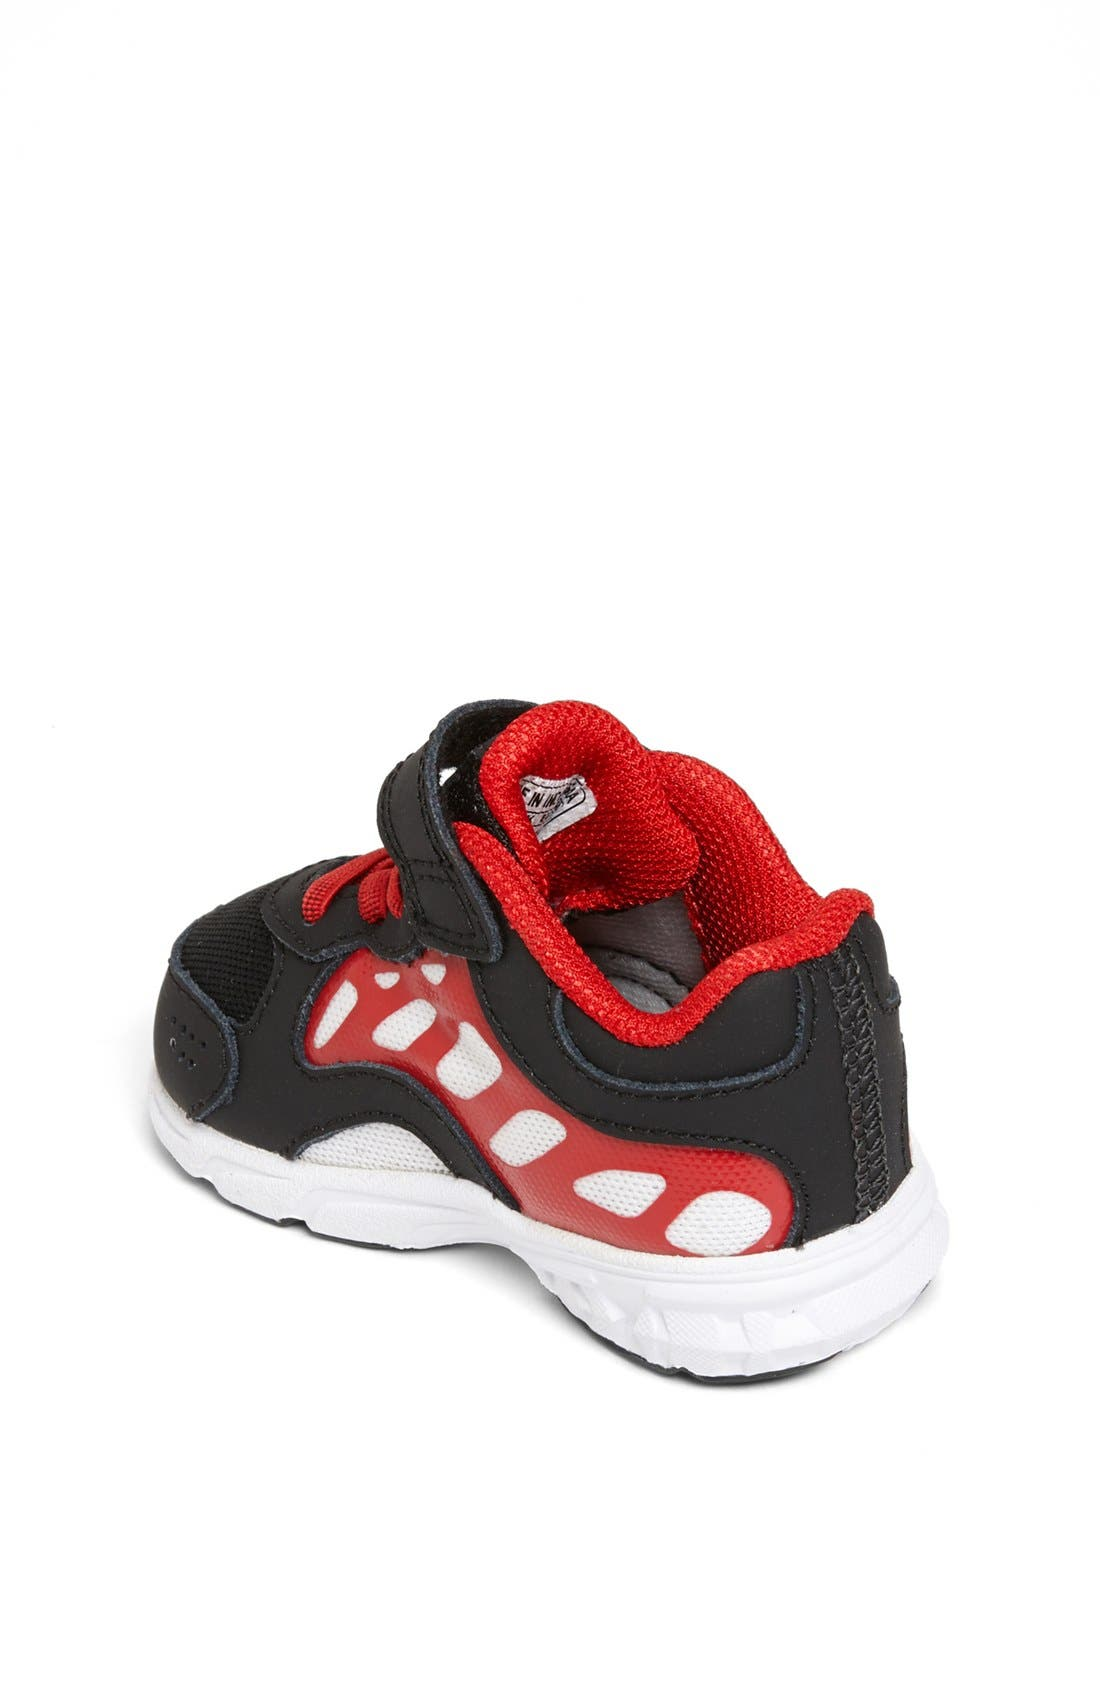 Alternate Image 2  - Under Armour 'Ignite' Sneaker (Baby, Walker & Toddler)